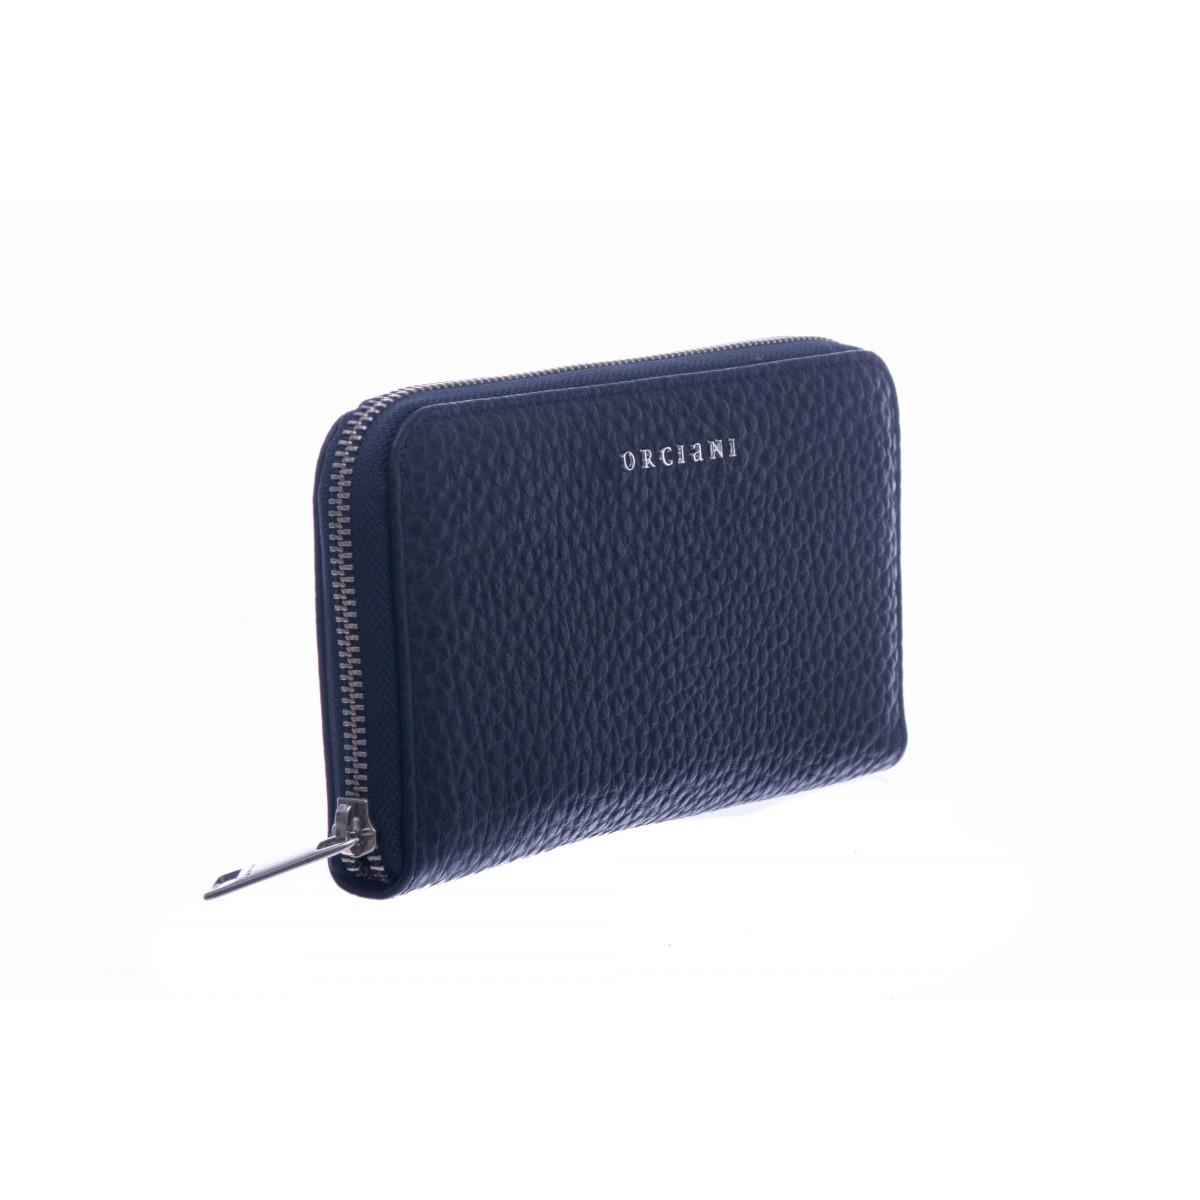 Borsa - Sd0047 soft portafoglio pelle